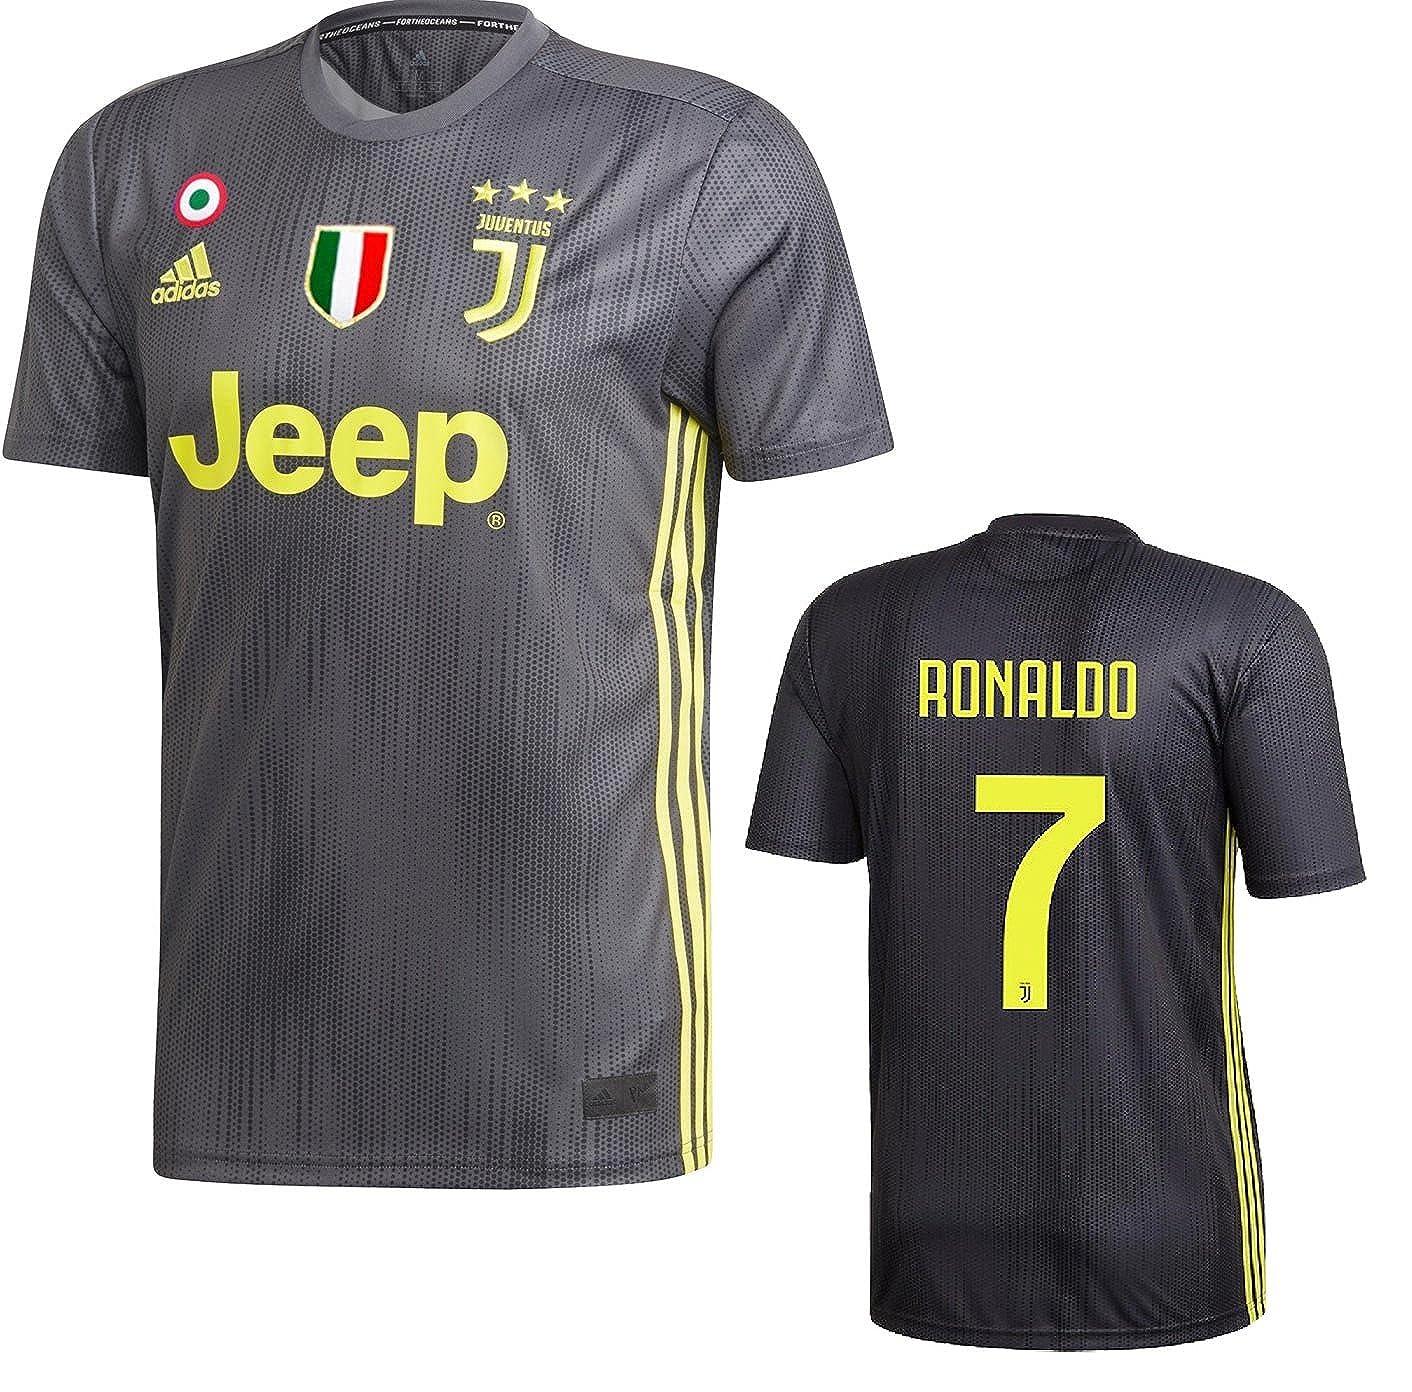 cheap for discount fddf4 fb291 Amazon.com: Juventus Ronaldo 3rd Black Jersey 2018/19 ...